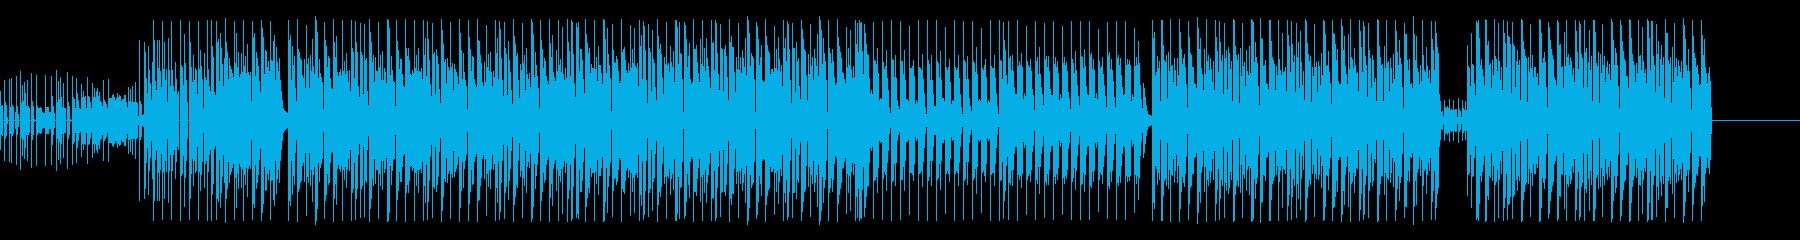 【Pf抜】軽快なピアノが印象的なEDMの再生済みの波形